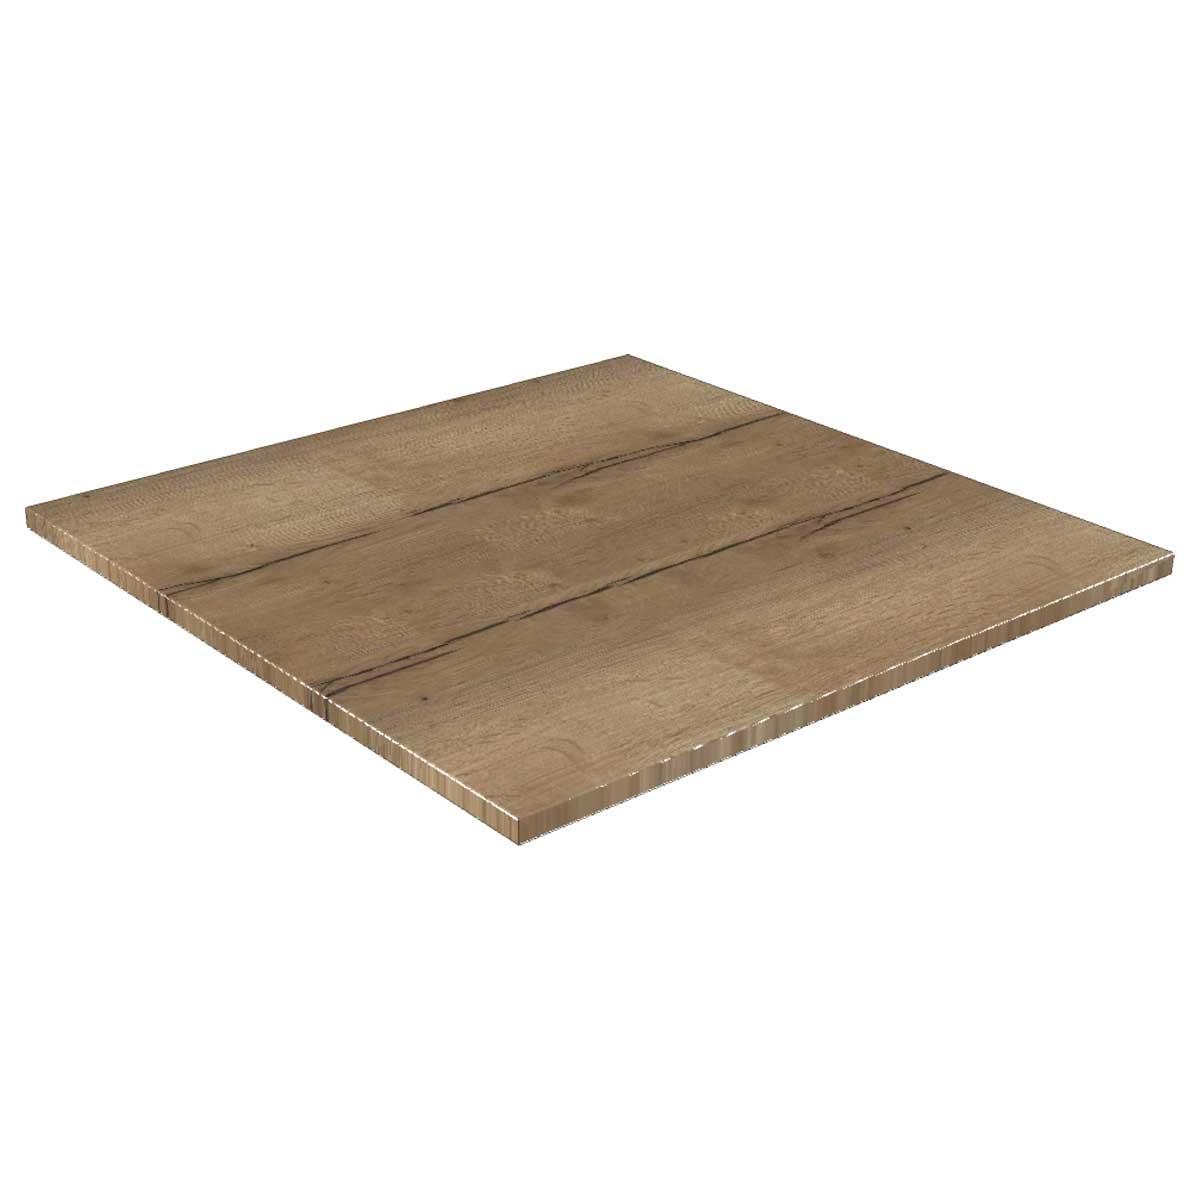 TICAM Q70 1180 - https://www.werzalit.com/en/product/table-top-cambium-q-65x65cm-board-thickness-39cm-decor-halifax-naturel/